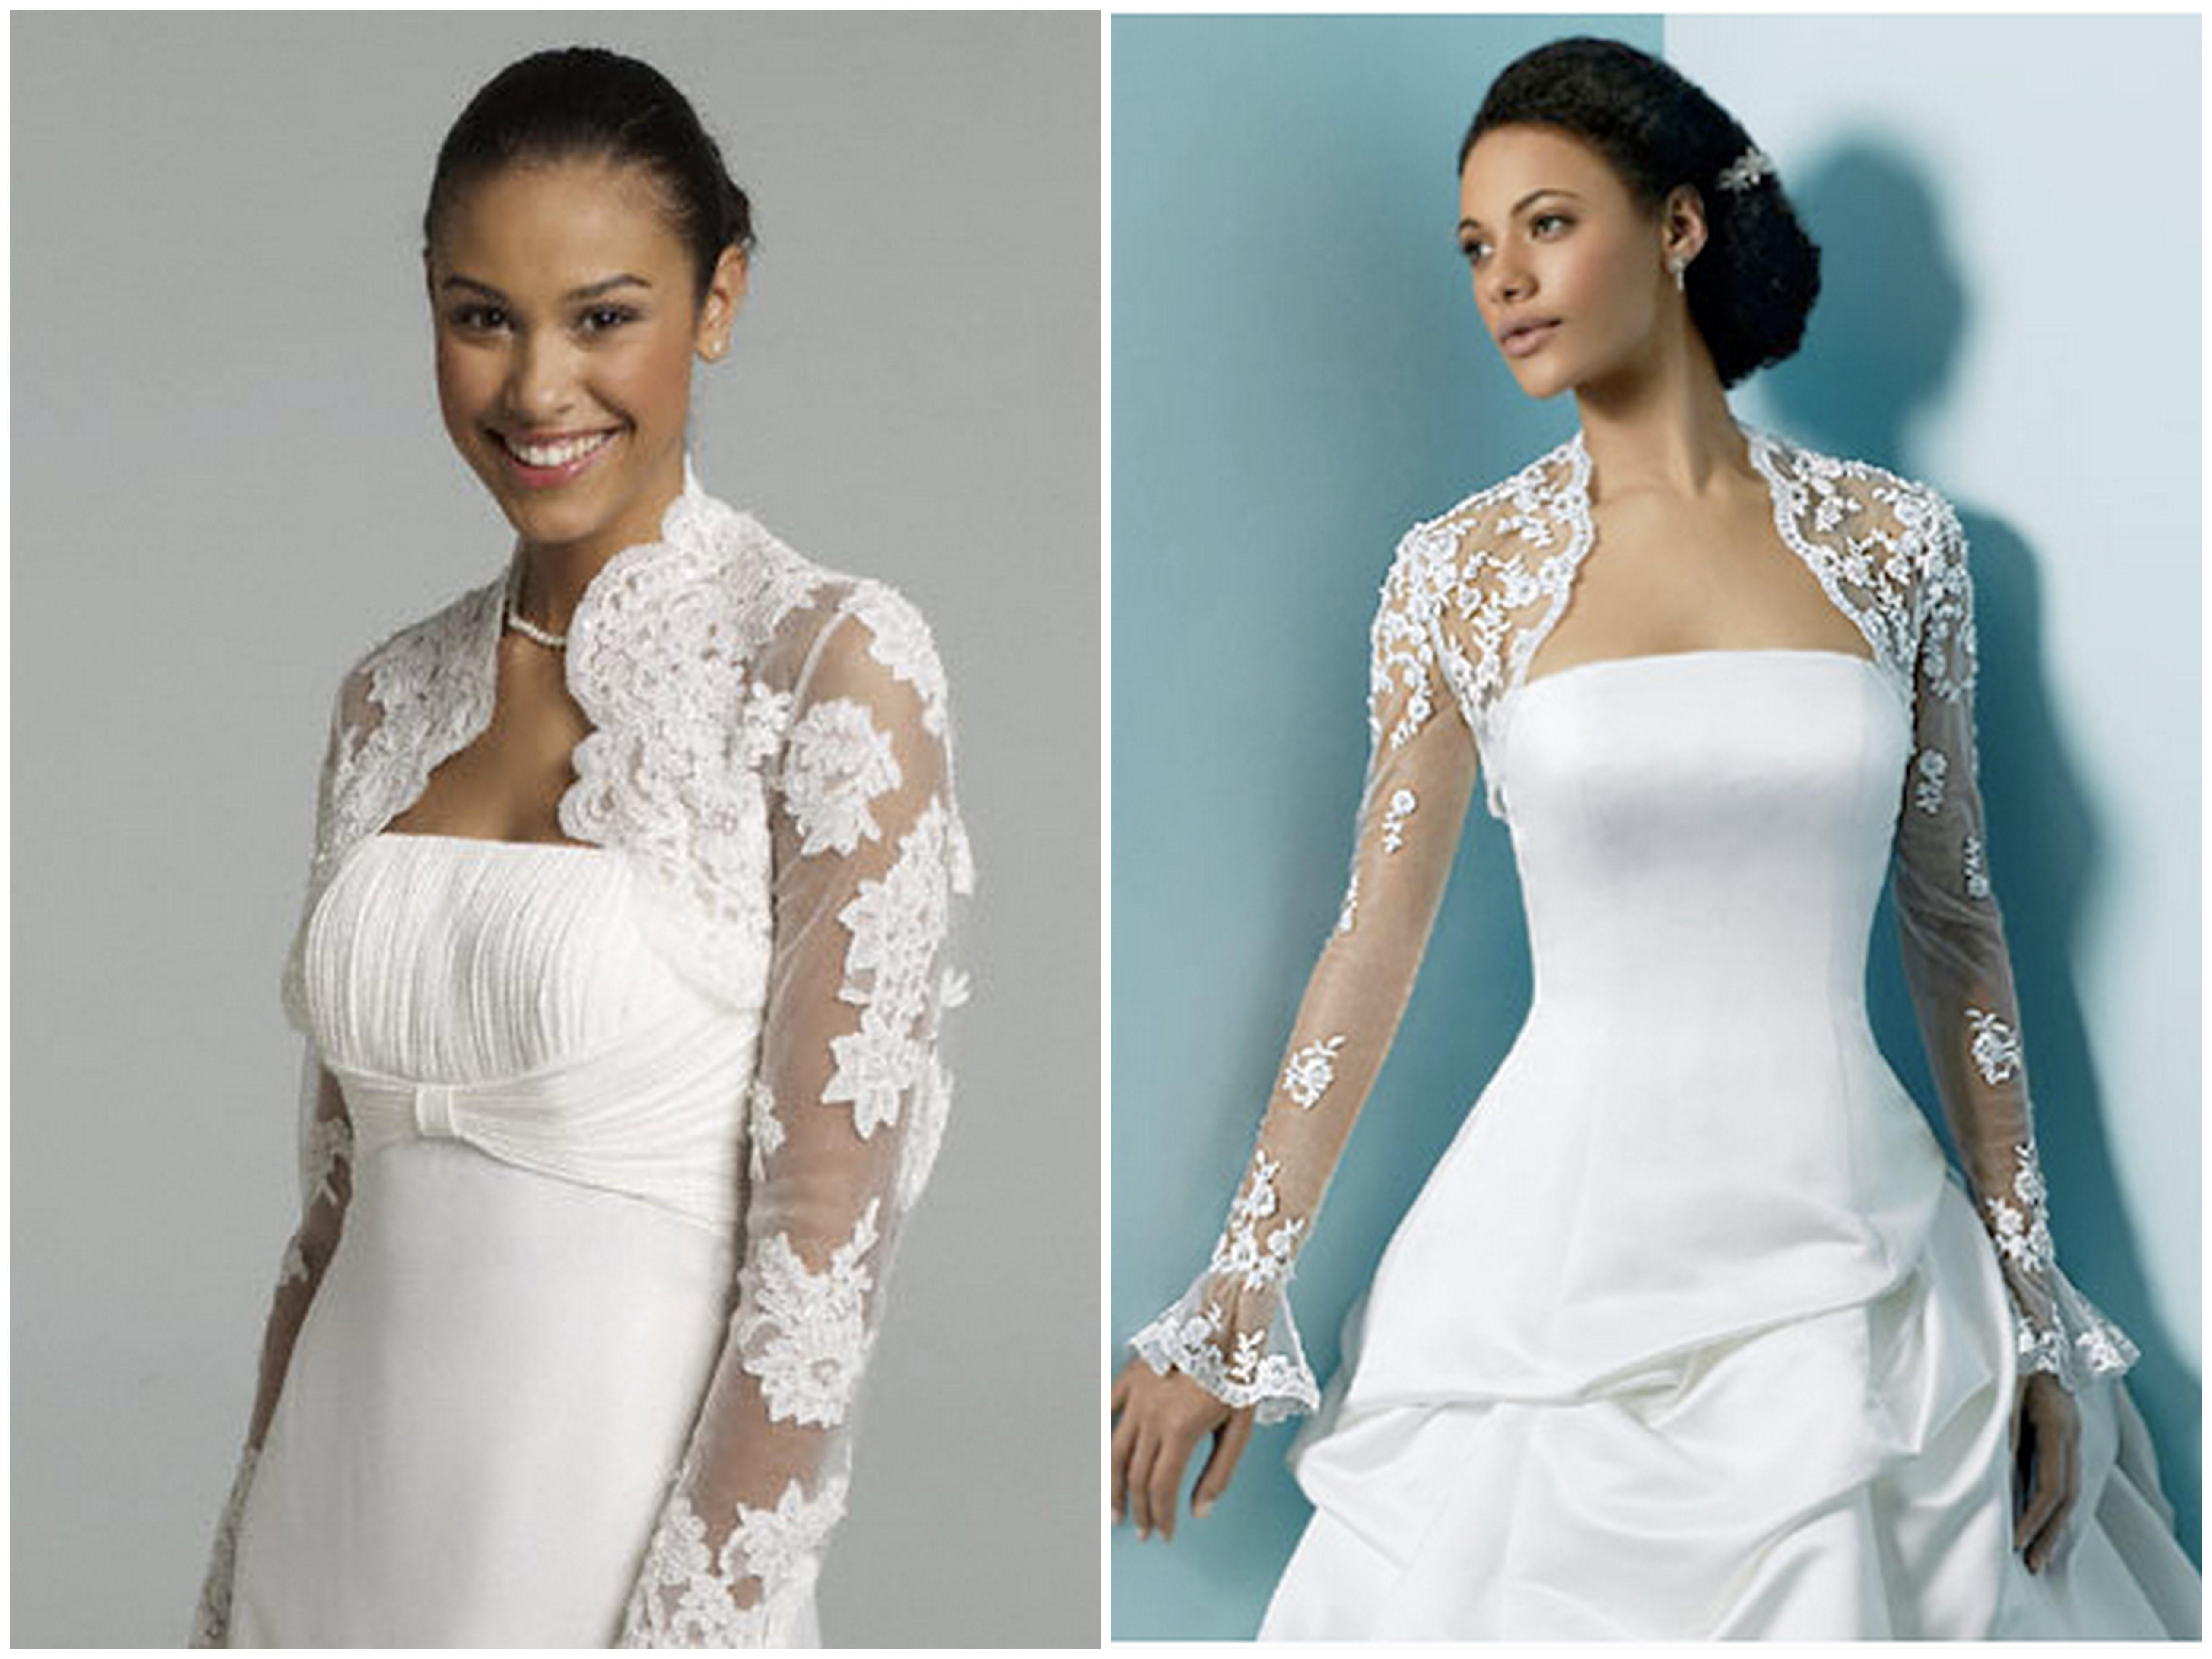 long sleeve wedding dress from davids bridal shop houston tx most popular wedding dresses Long Sleeve Wedding Dress from David s Bridal Shop Houston tX